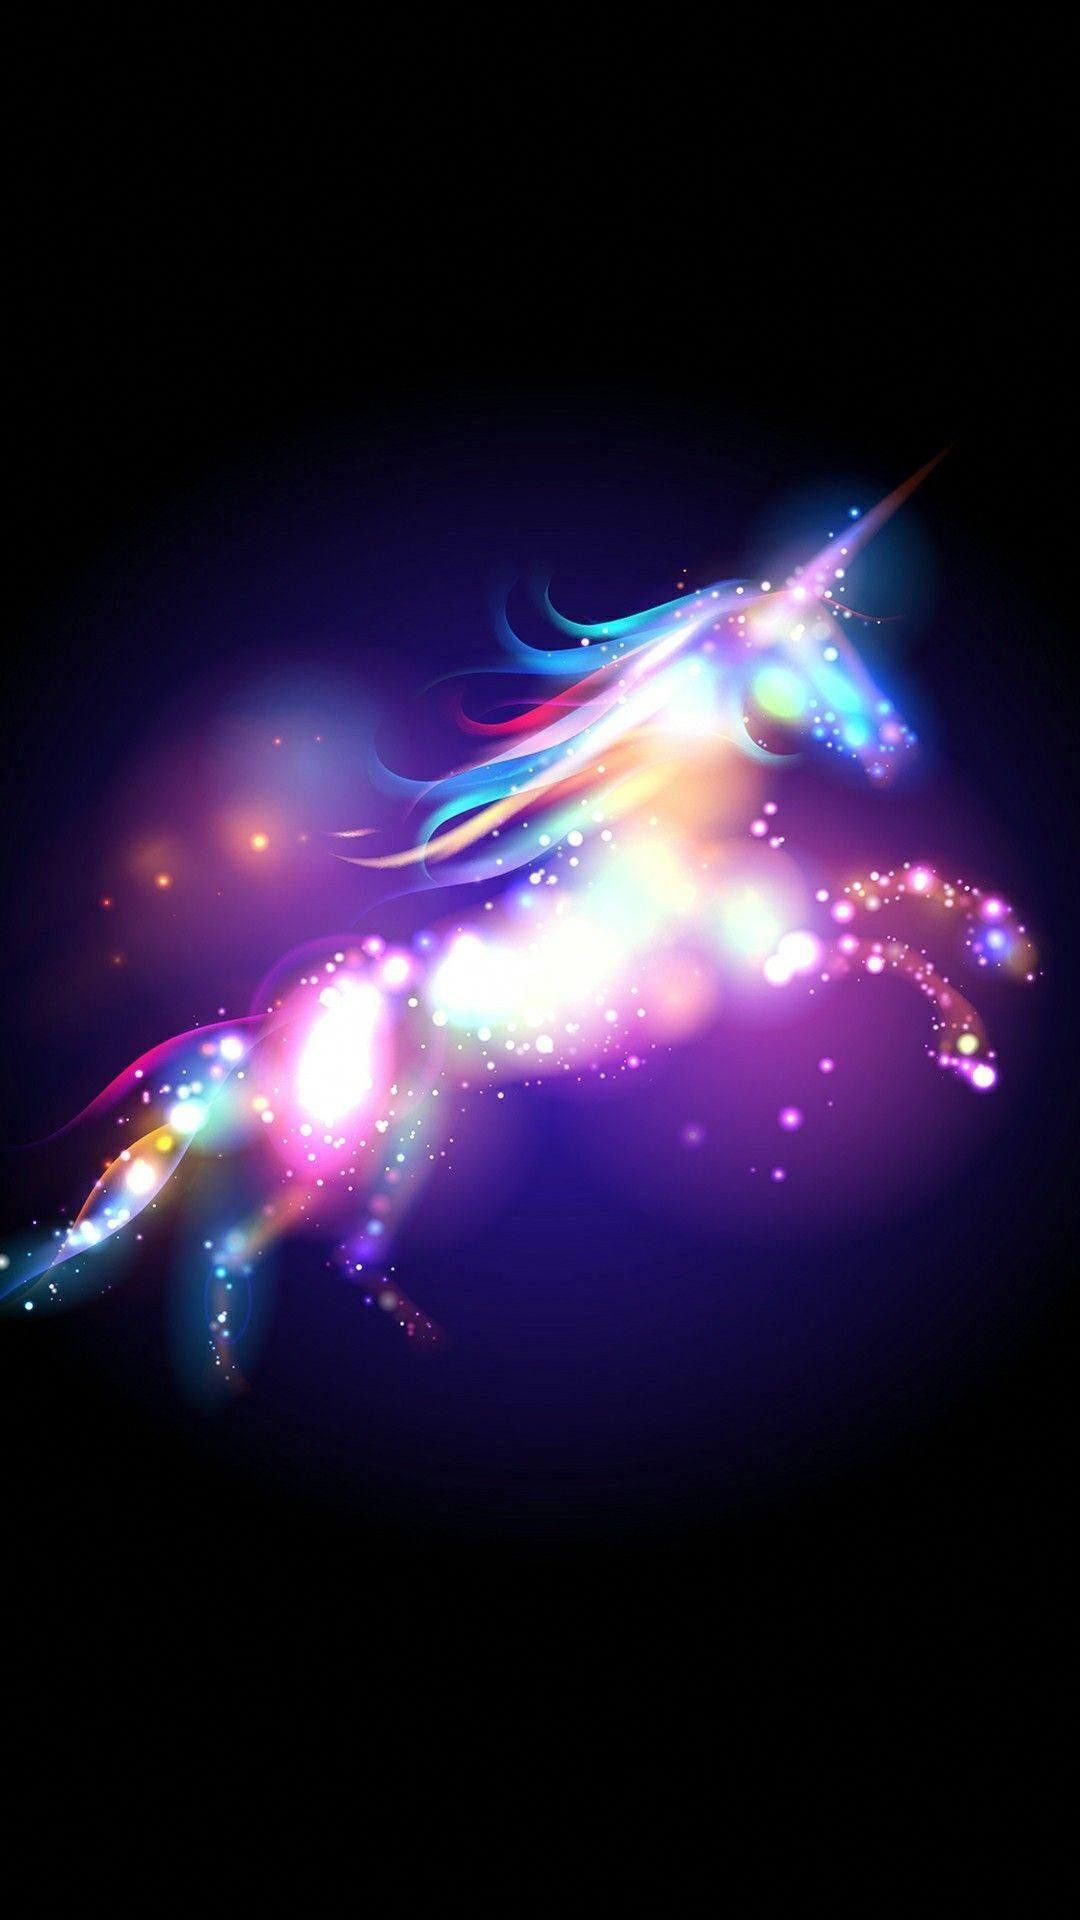 You Ni Corn Hahahaha Unicornart Unicorn Wallpaper Cute Unicorn Wallpaper Unicorn Backgrounds